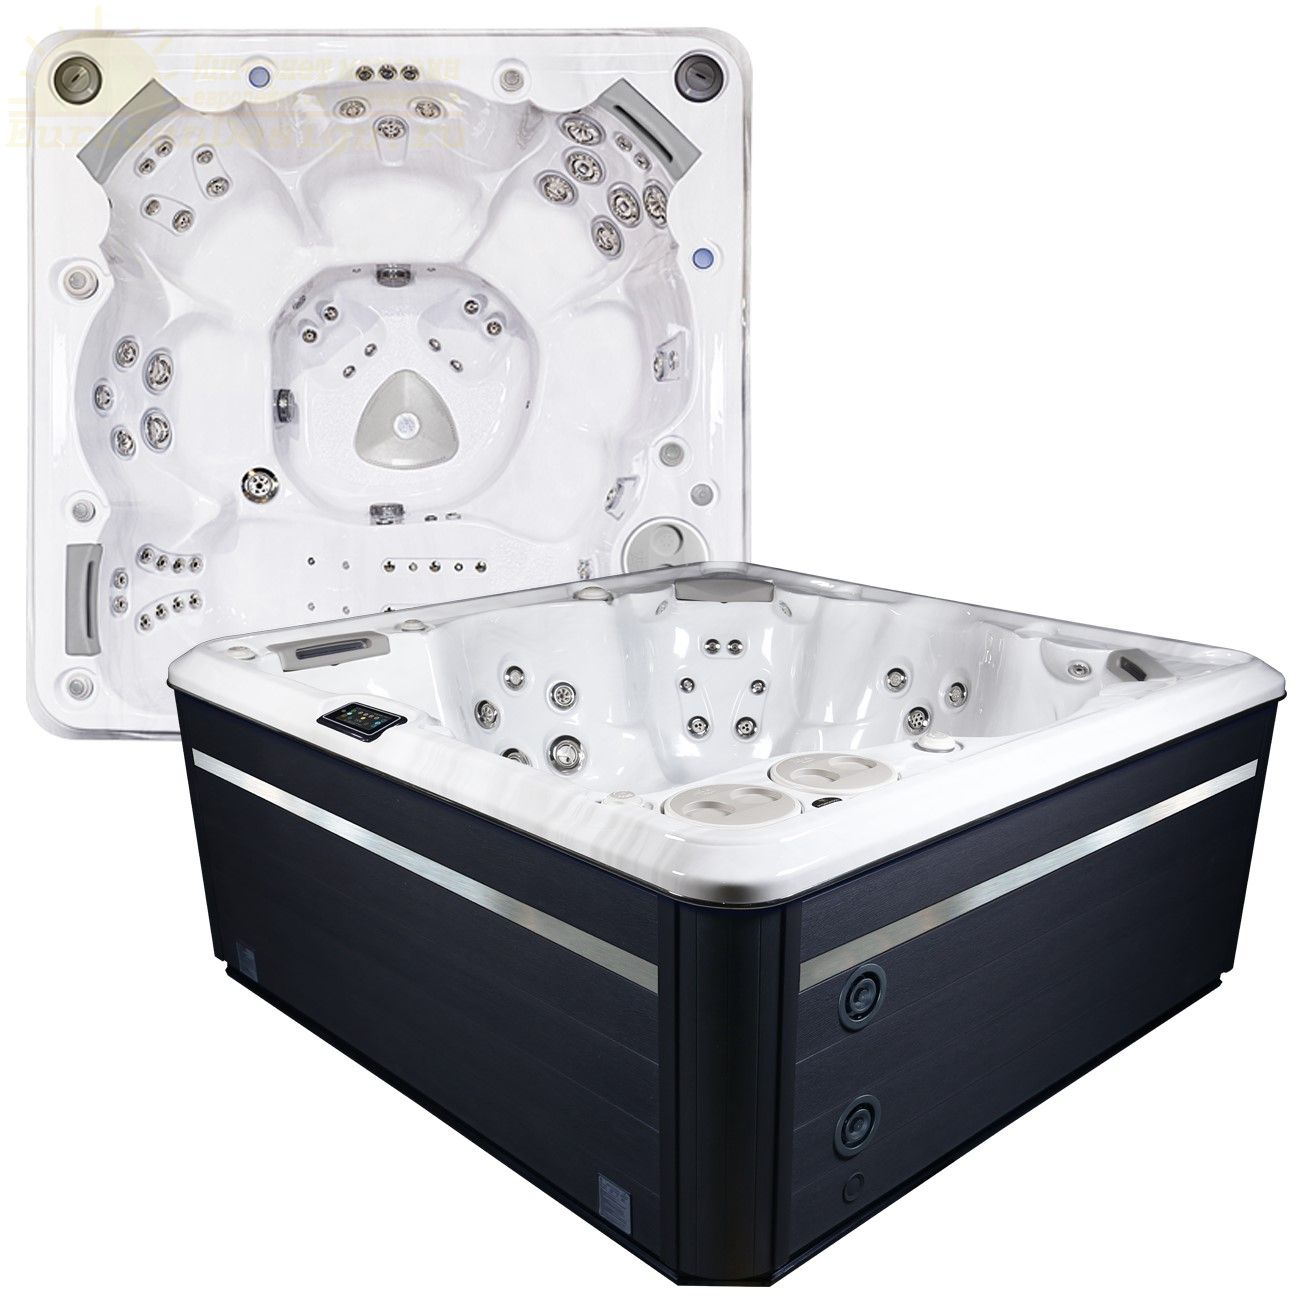 Семиместный СПА бассейн Hydropool Self Cleaning 770 Platinum 228х228 ФОТО